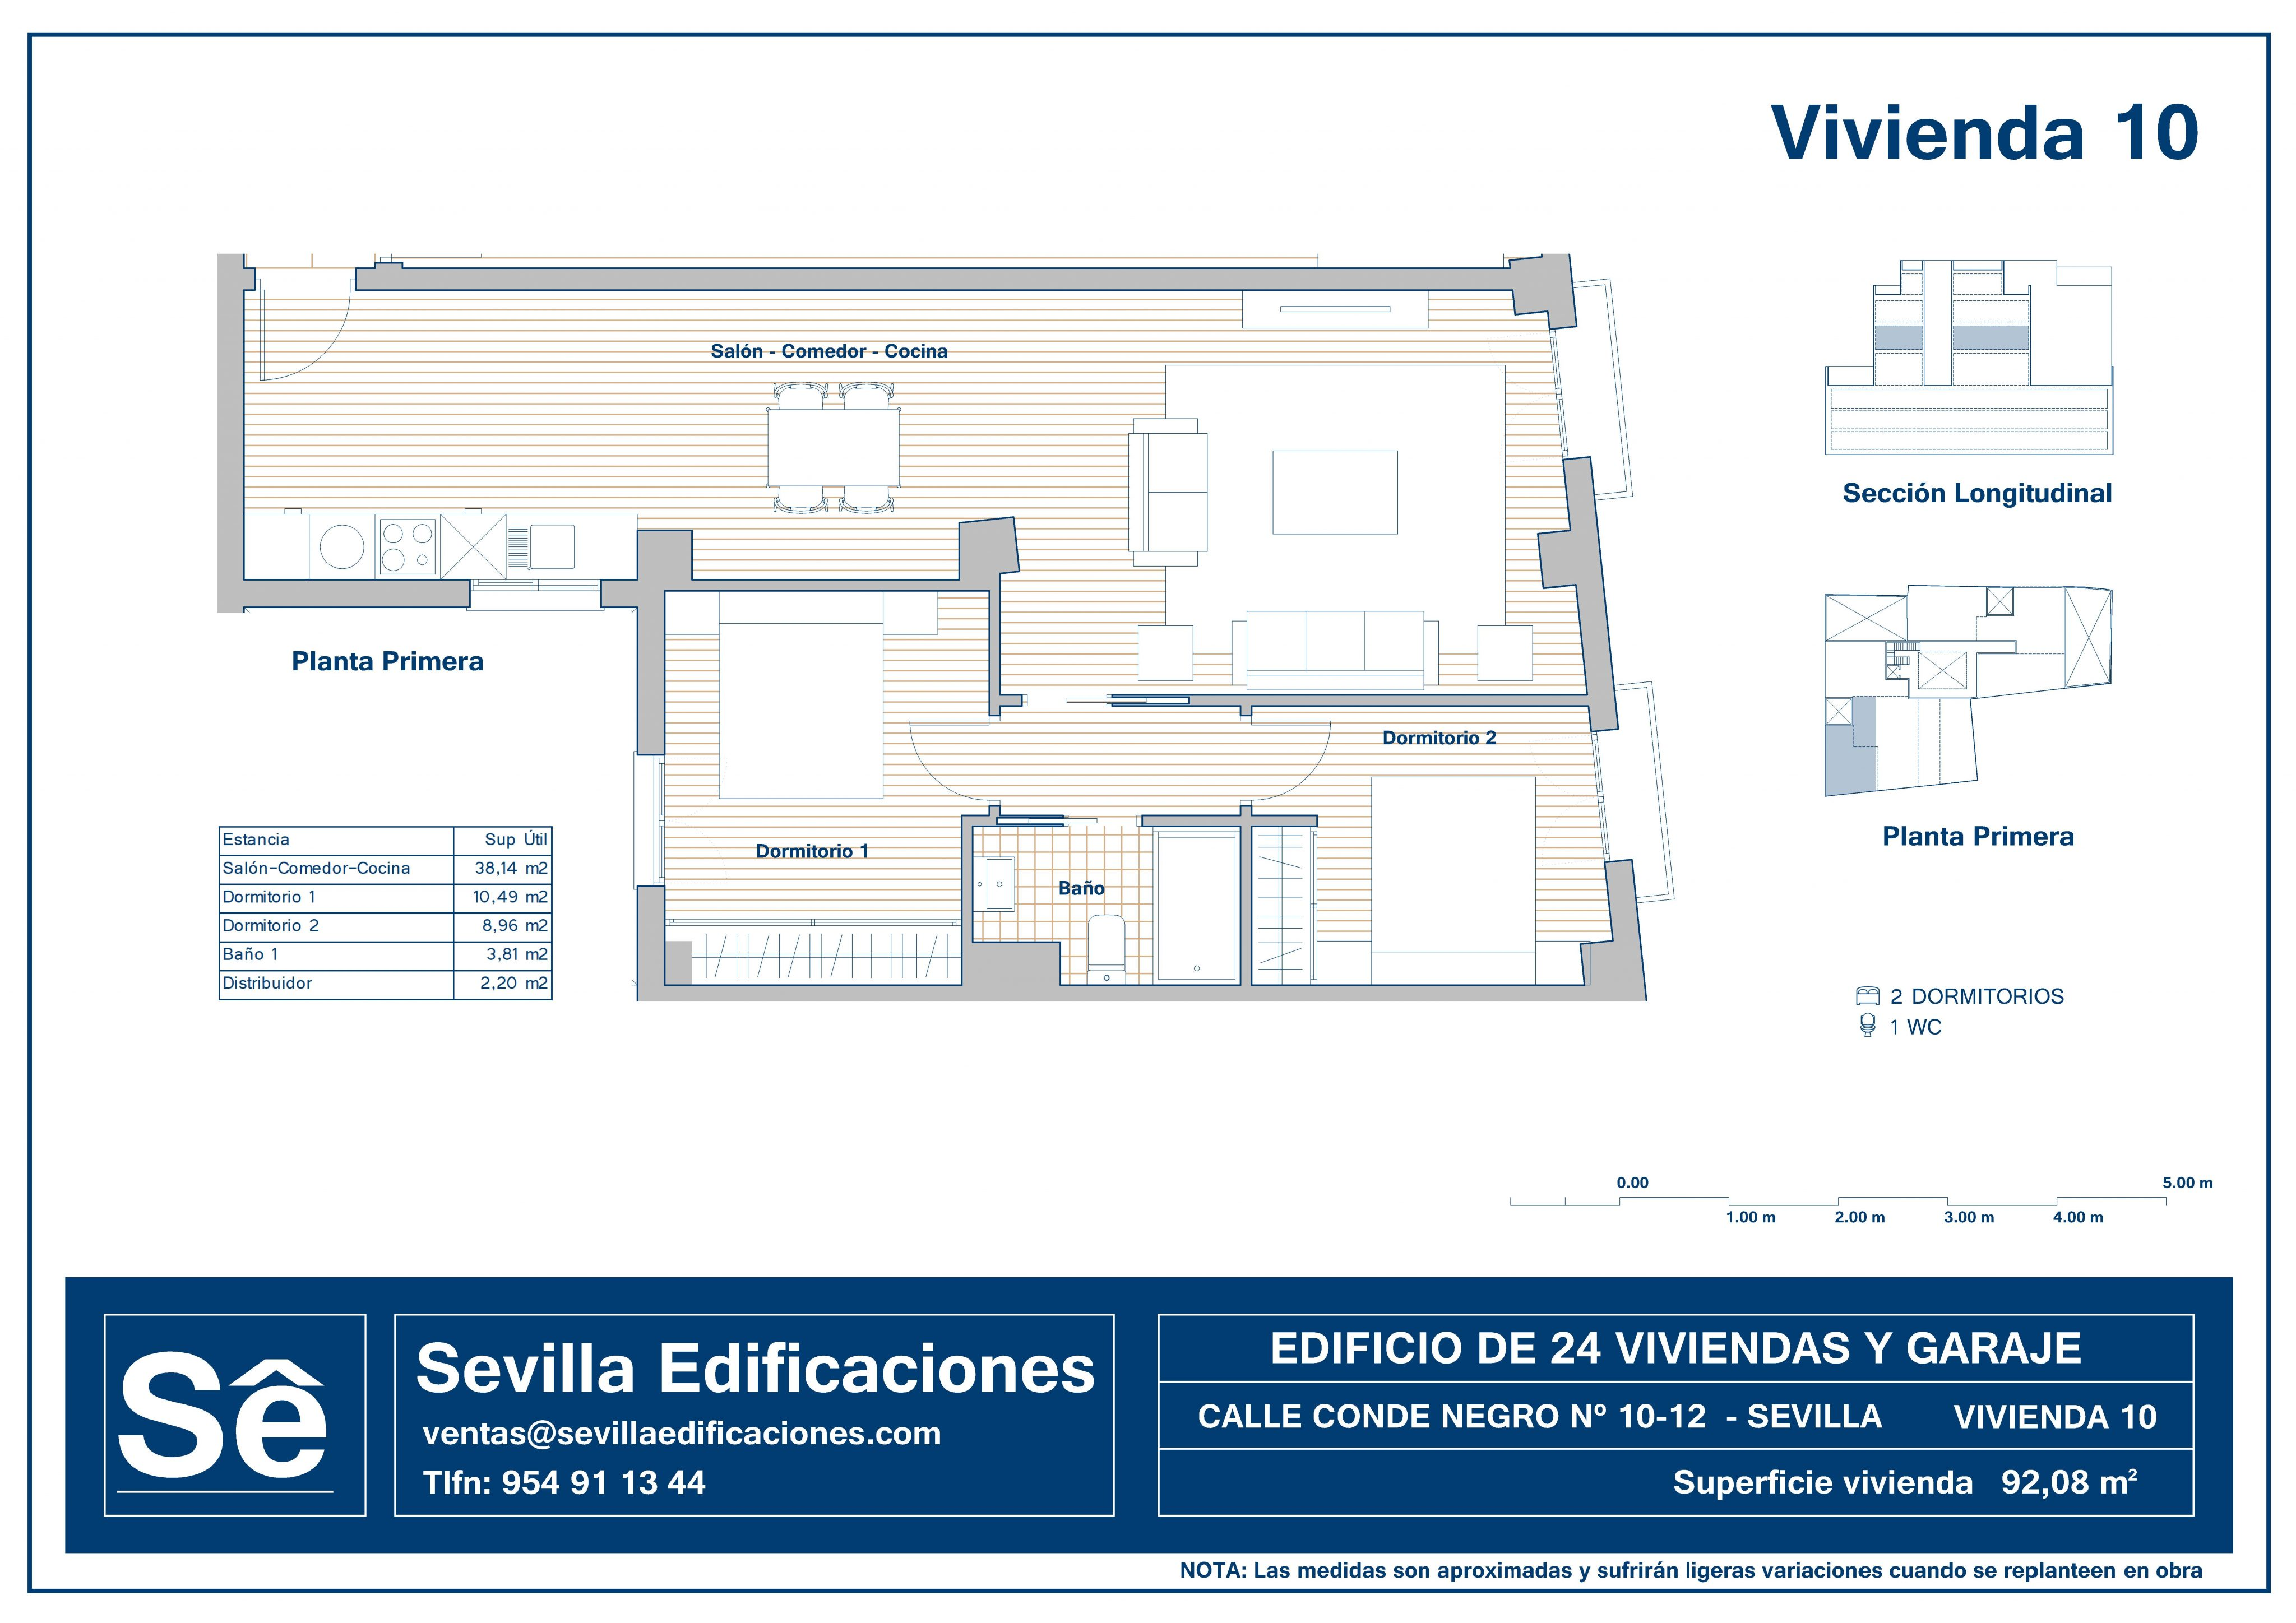 CONDENEGRO_VIVIENDA_10